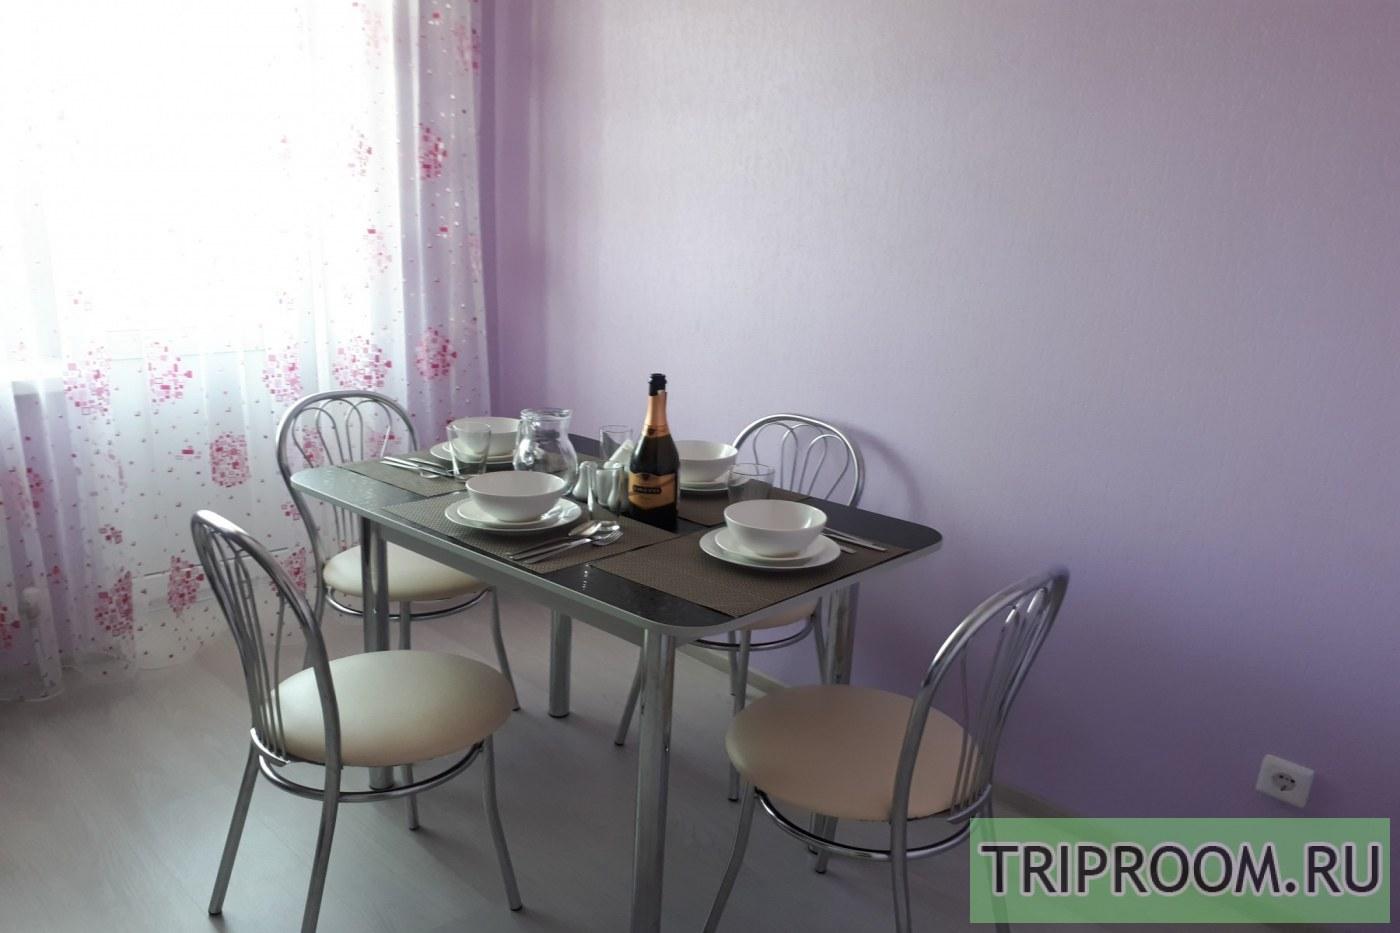 2-комнатная квартира посуточно (вариант № 39032), ул. Симиренко улица, фото № 8